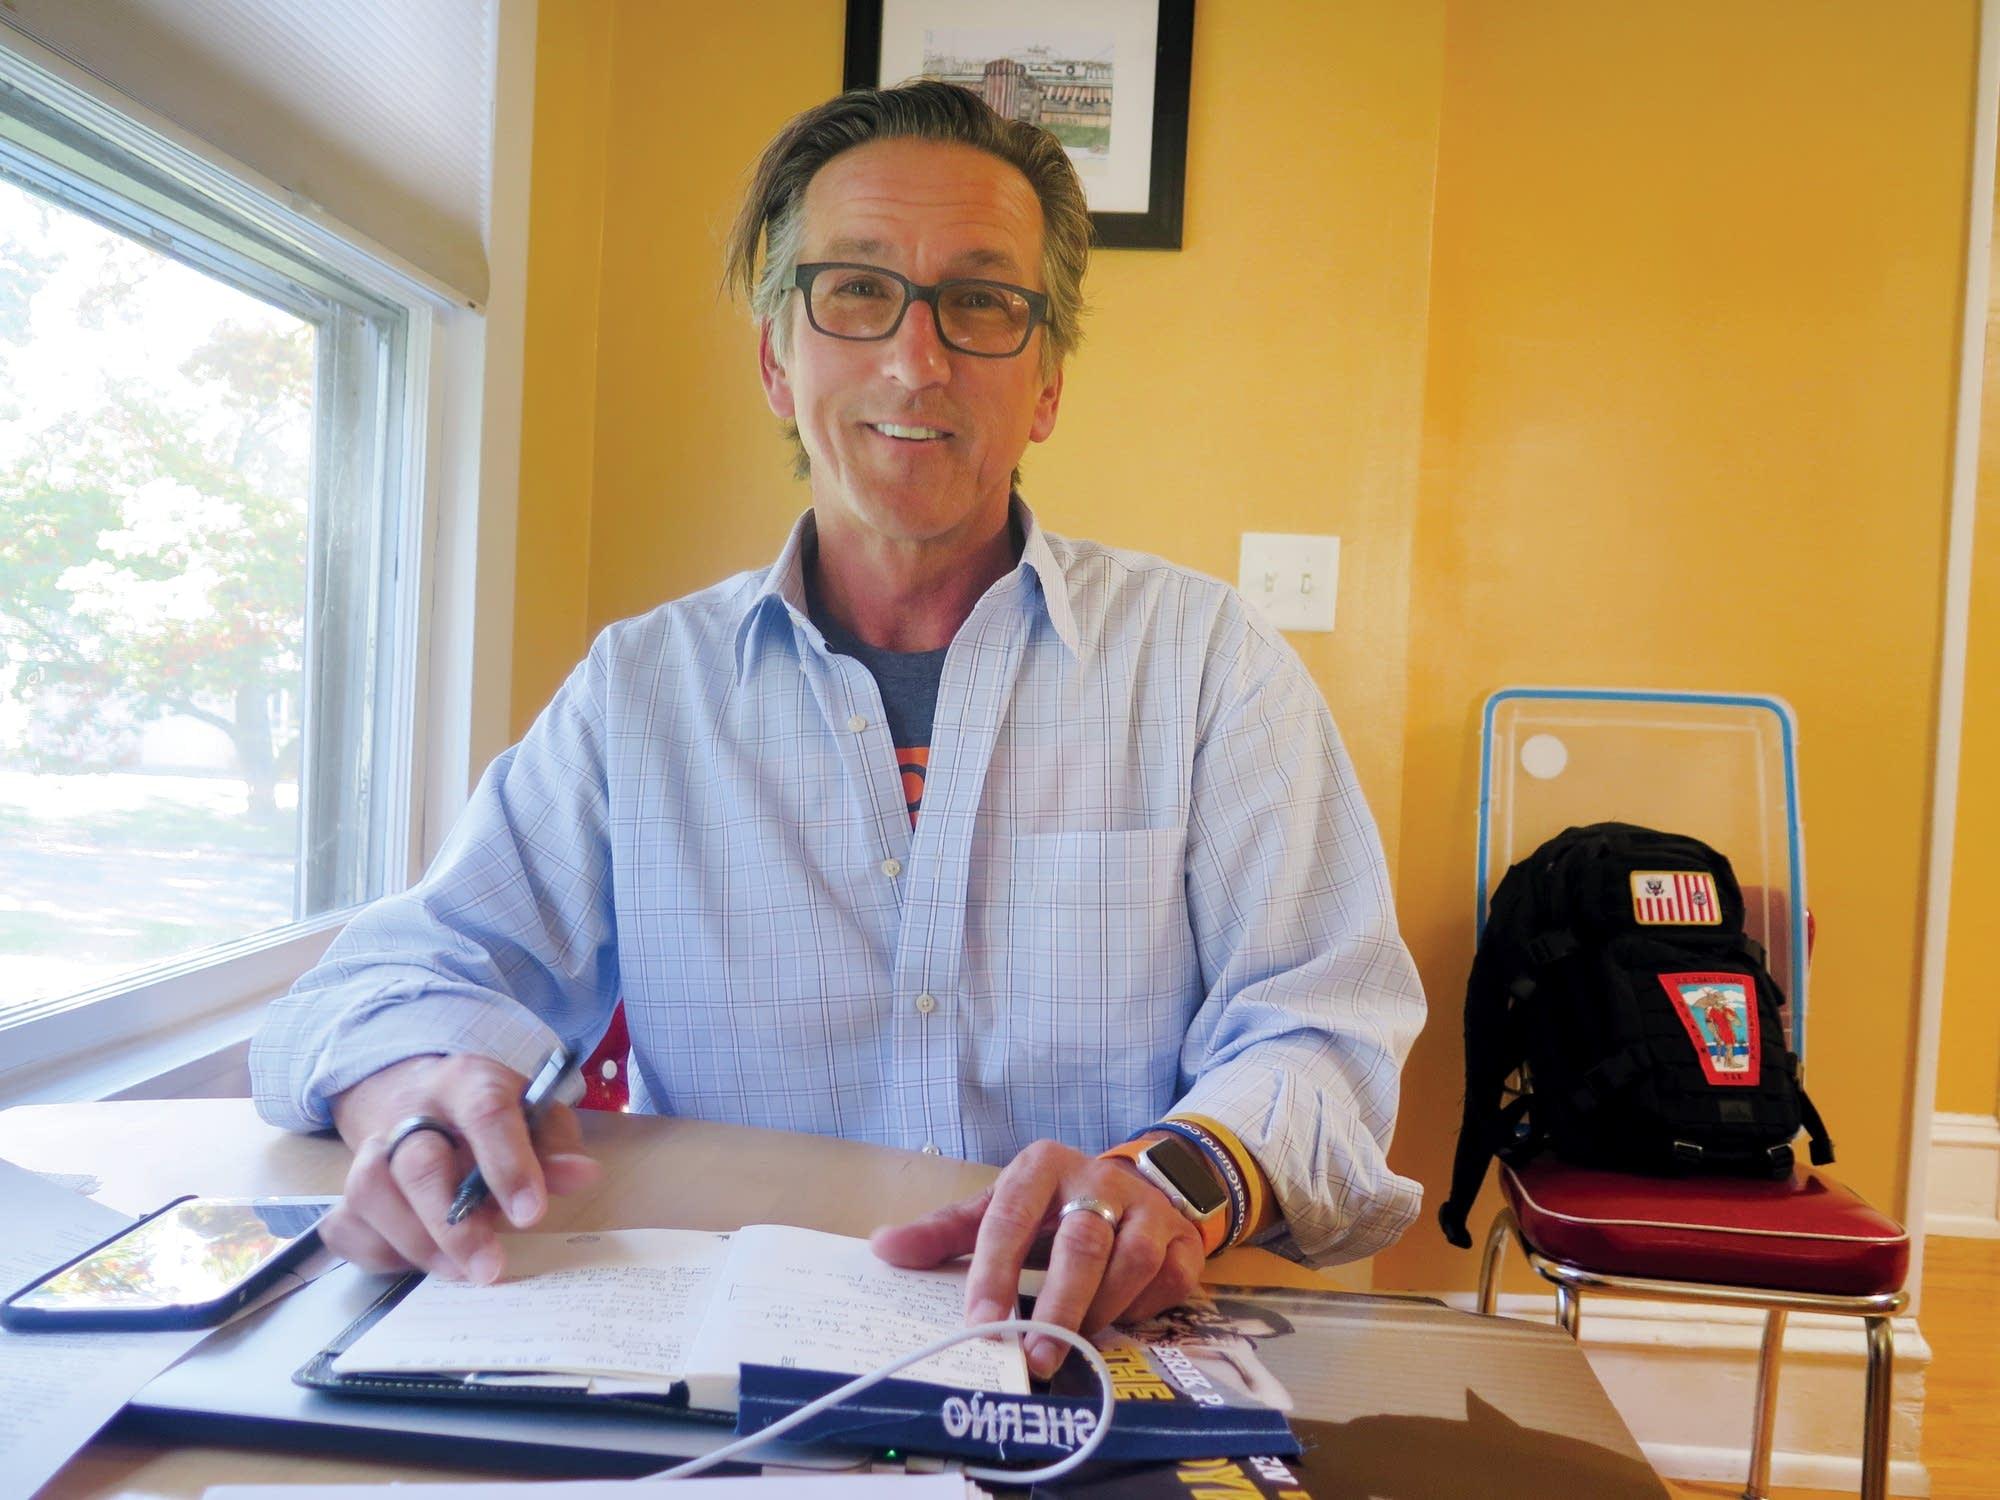 Former TV news broadcaster Tim Sherno